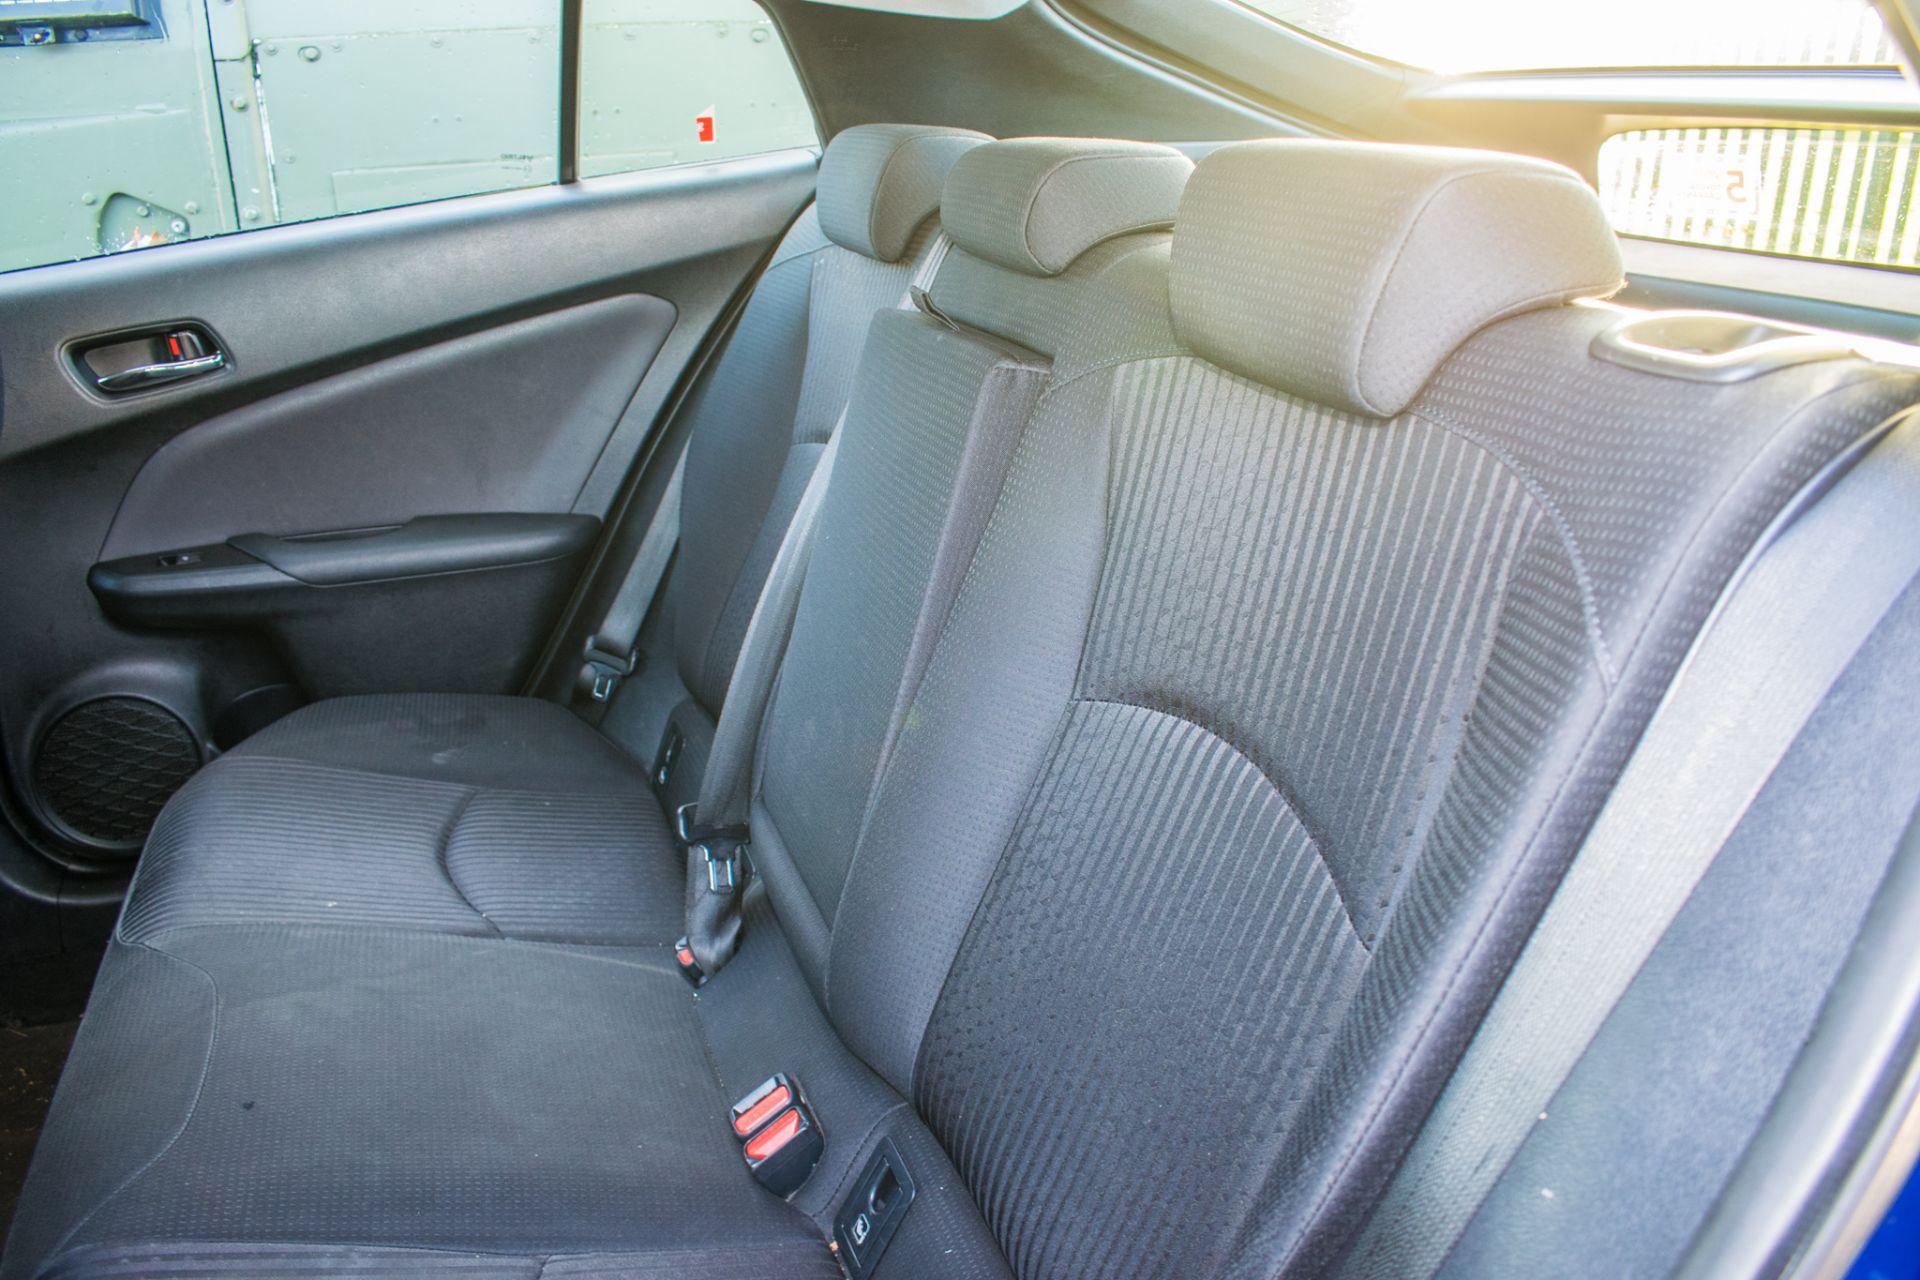 ToyotaPrius ActiveHybrid Electric 5 doorHatchback  Registration Number: LM67 OKH Date of First - Image 15 of 17